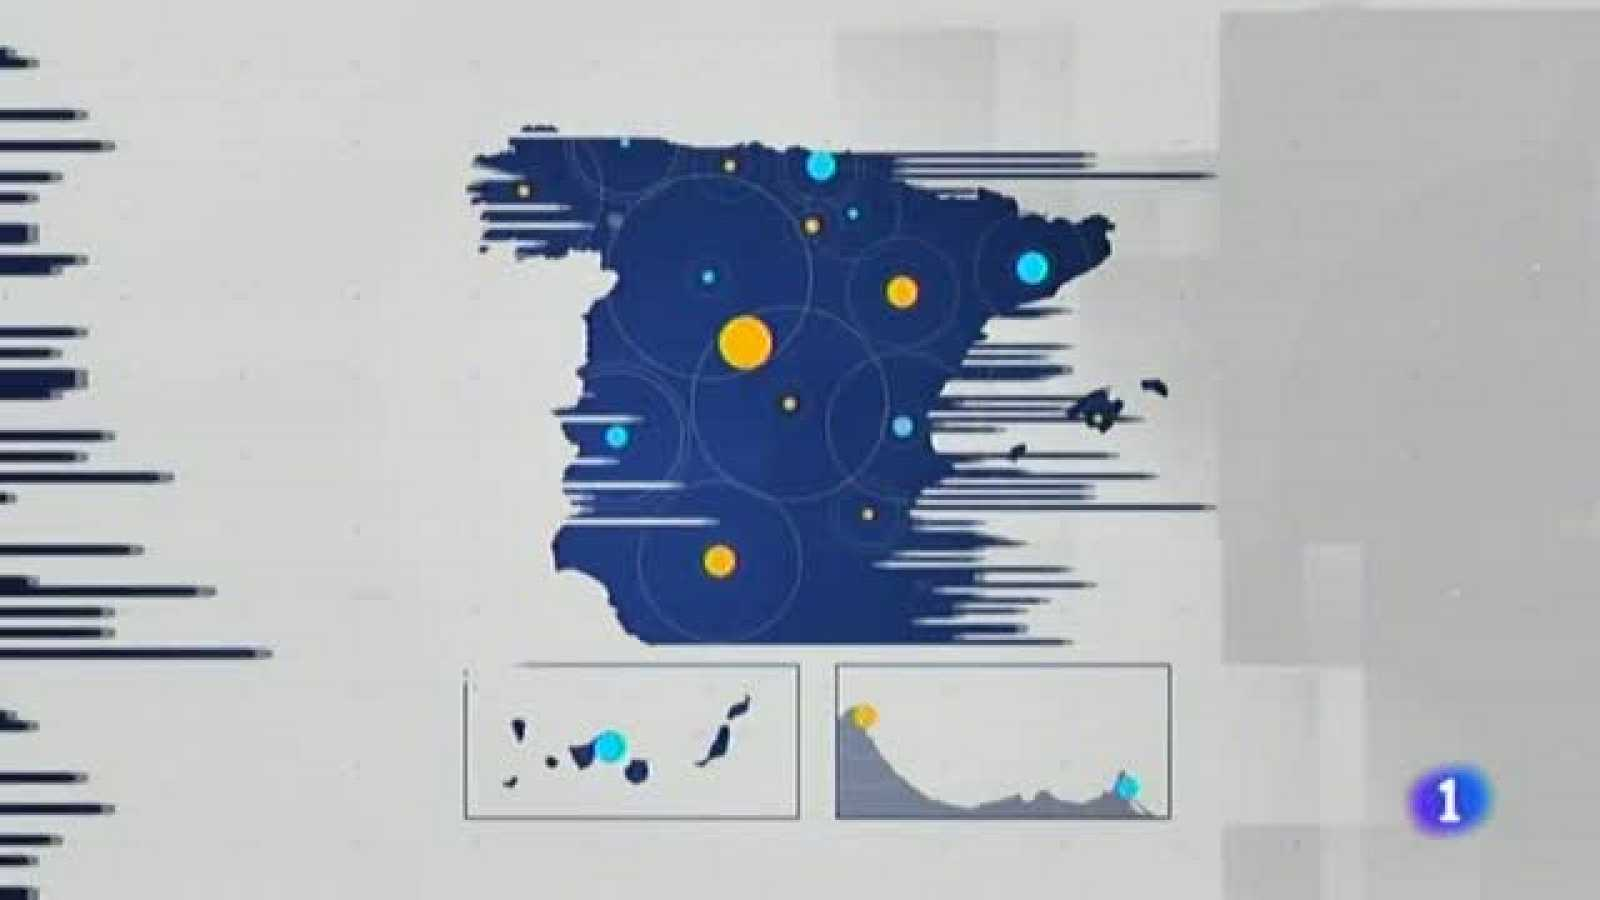 Noticias Murcia 2 - 29/03/2021